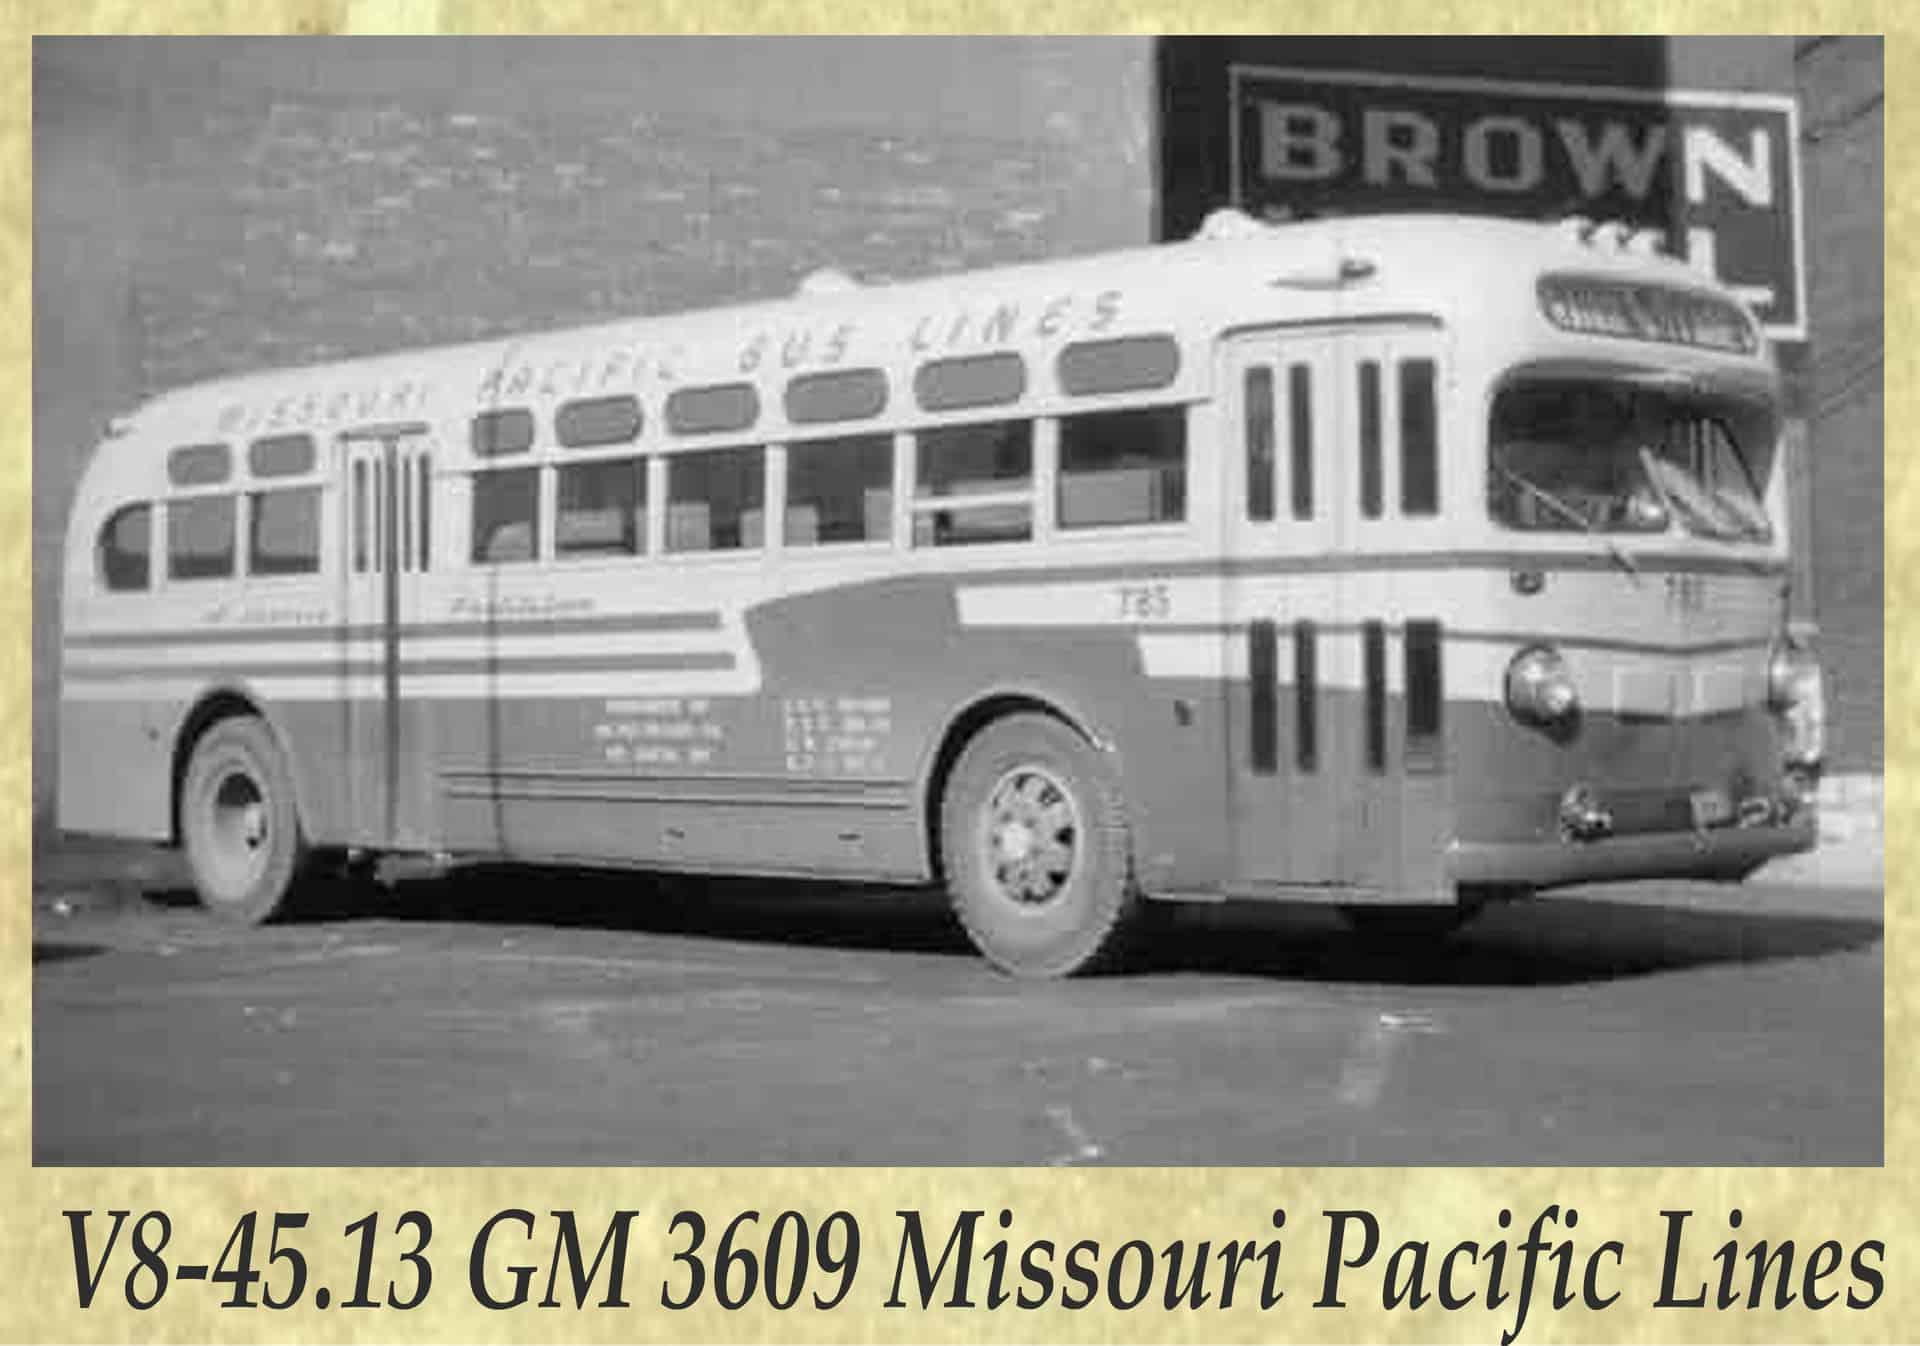 V8-45.13 GM 3609 Missouri Pacific Lines